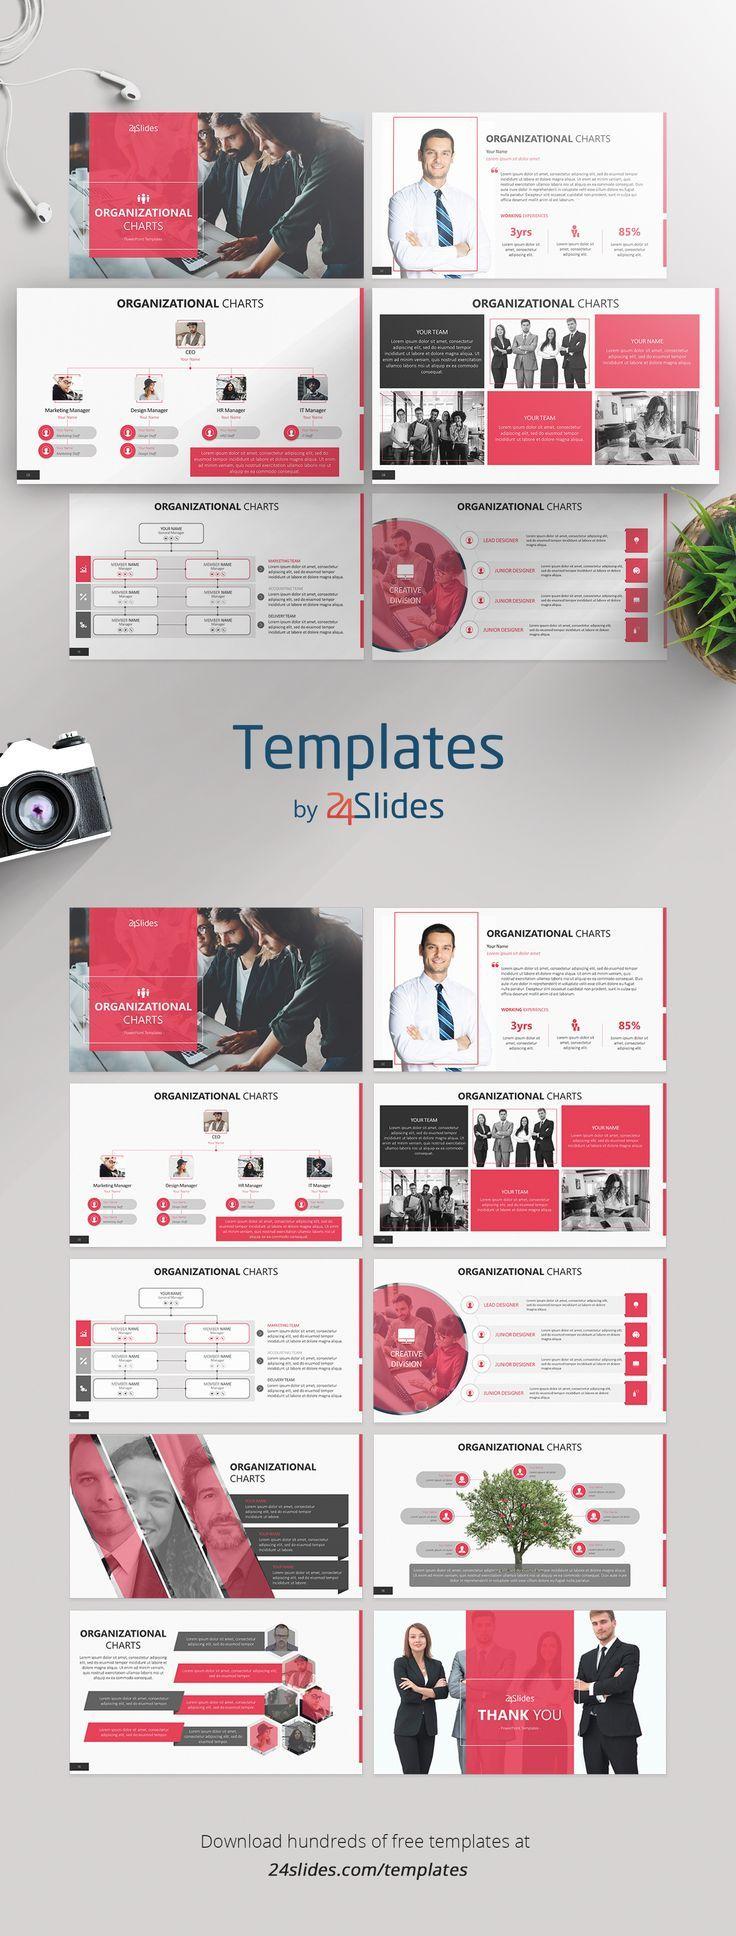 Corporateidentity Corporatedesign Powerpoint Keynote Design